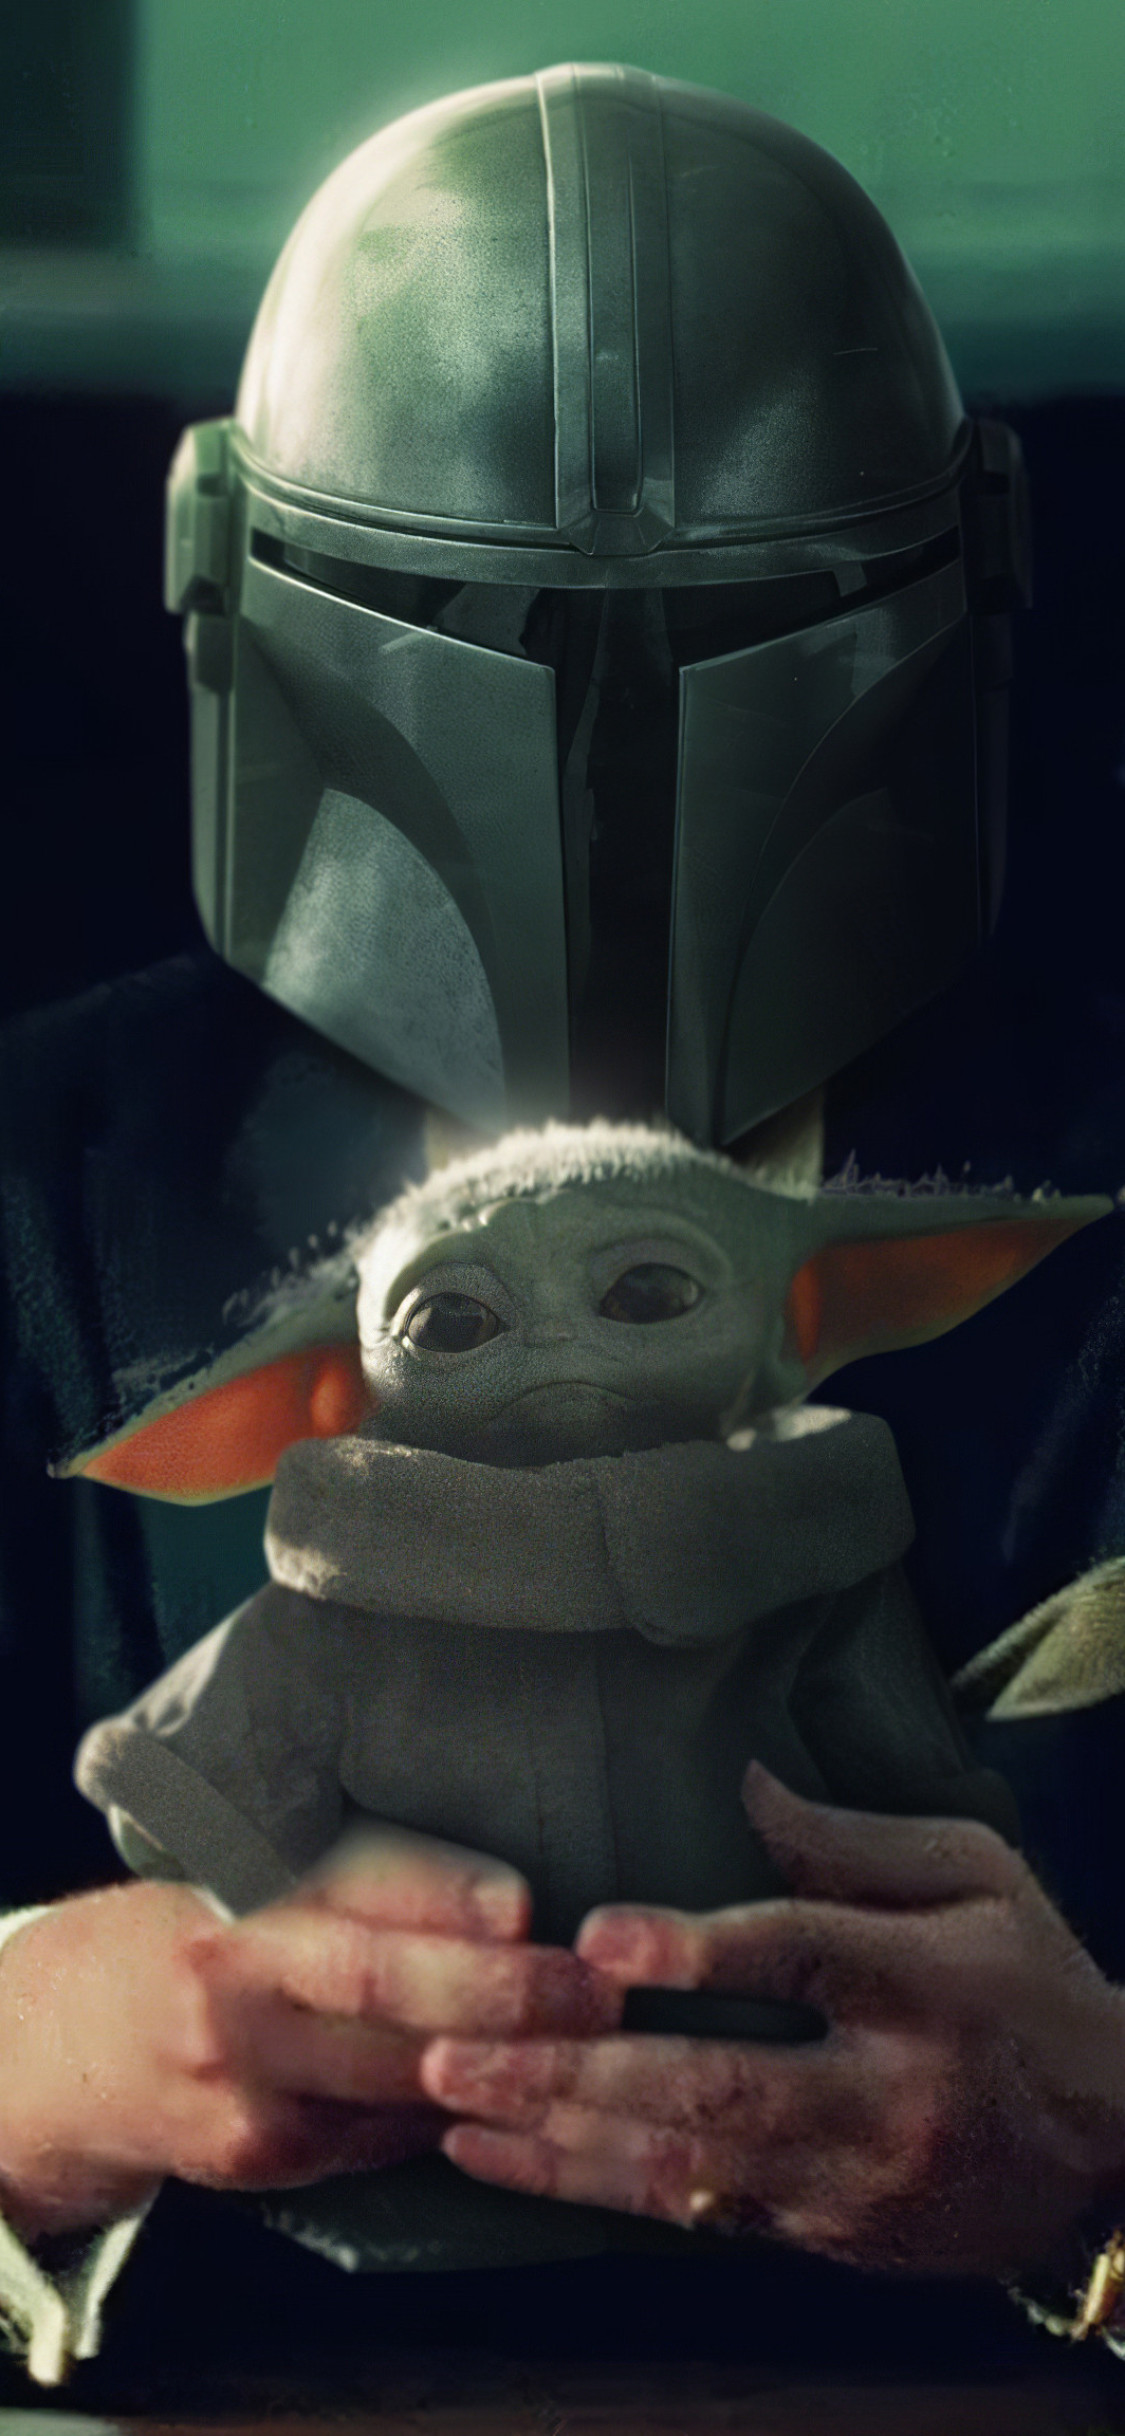 Mandalorian And Baby Yoda Wallpaper 4k 1125x2436 Wallpaper Teahub Io